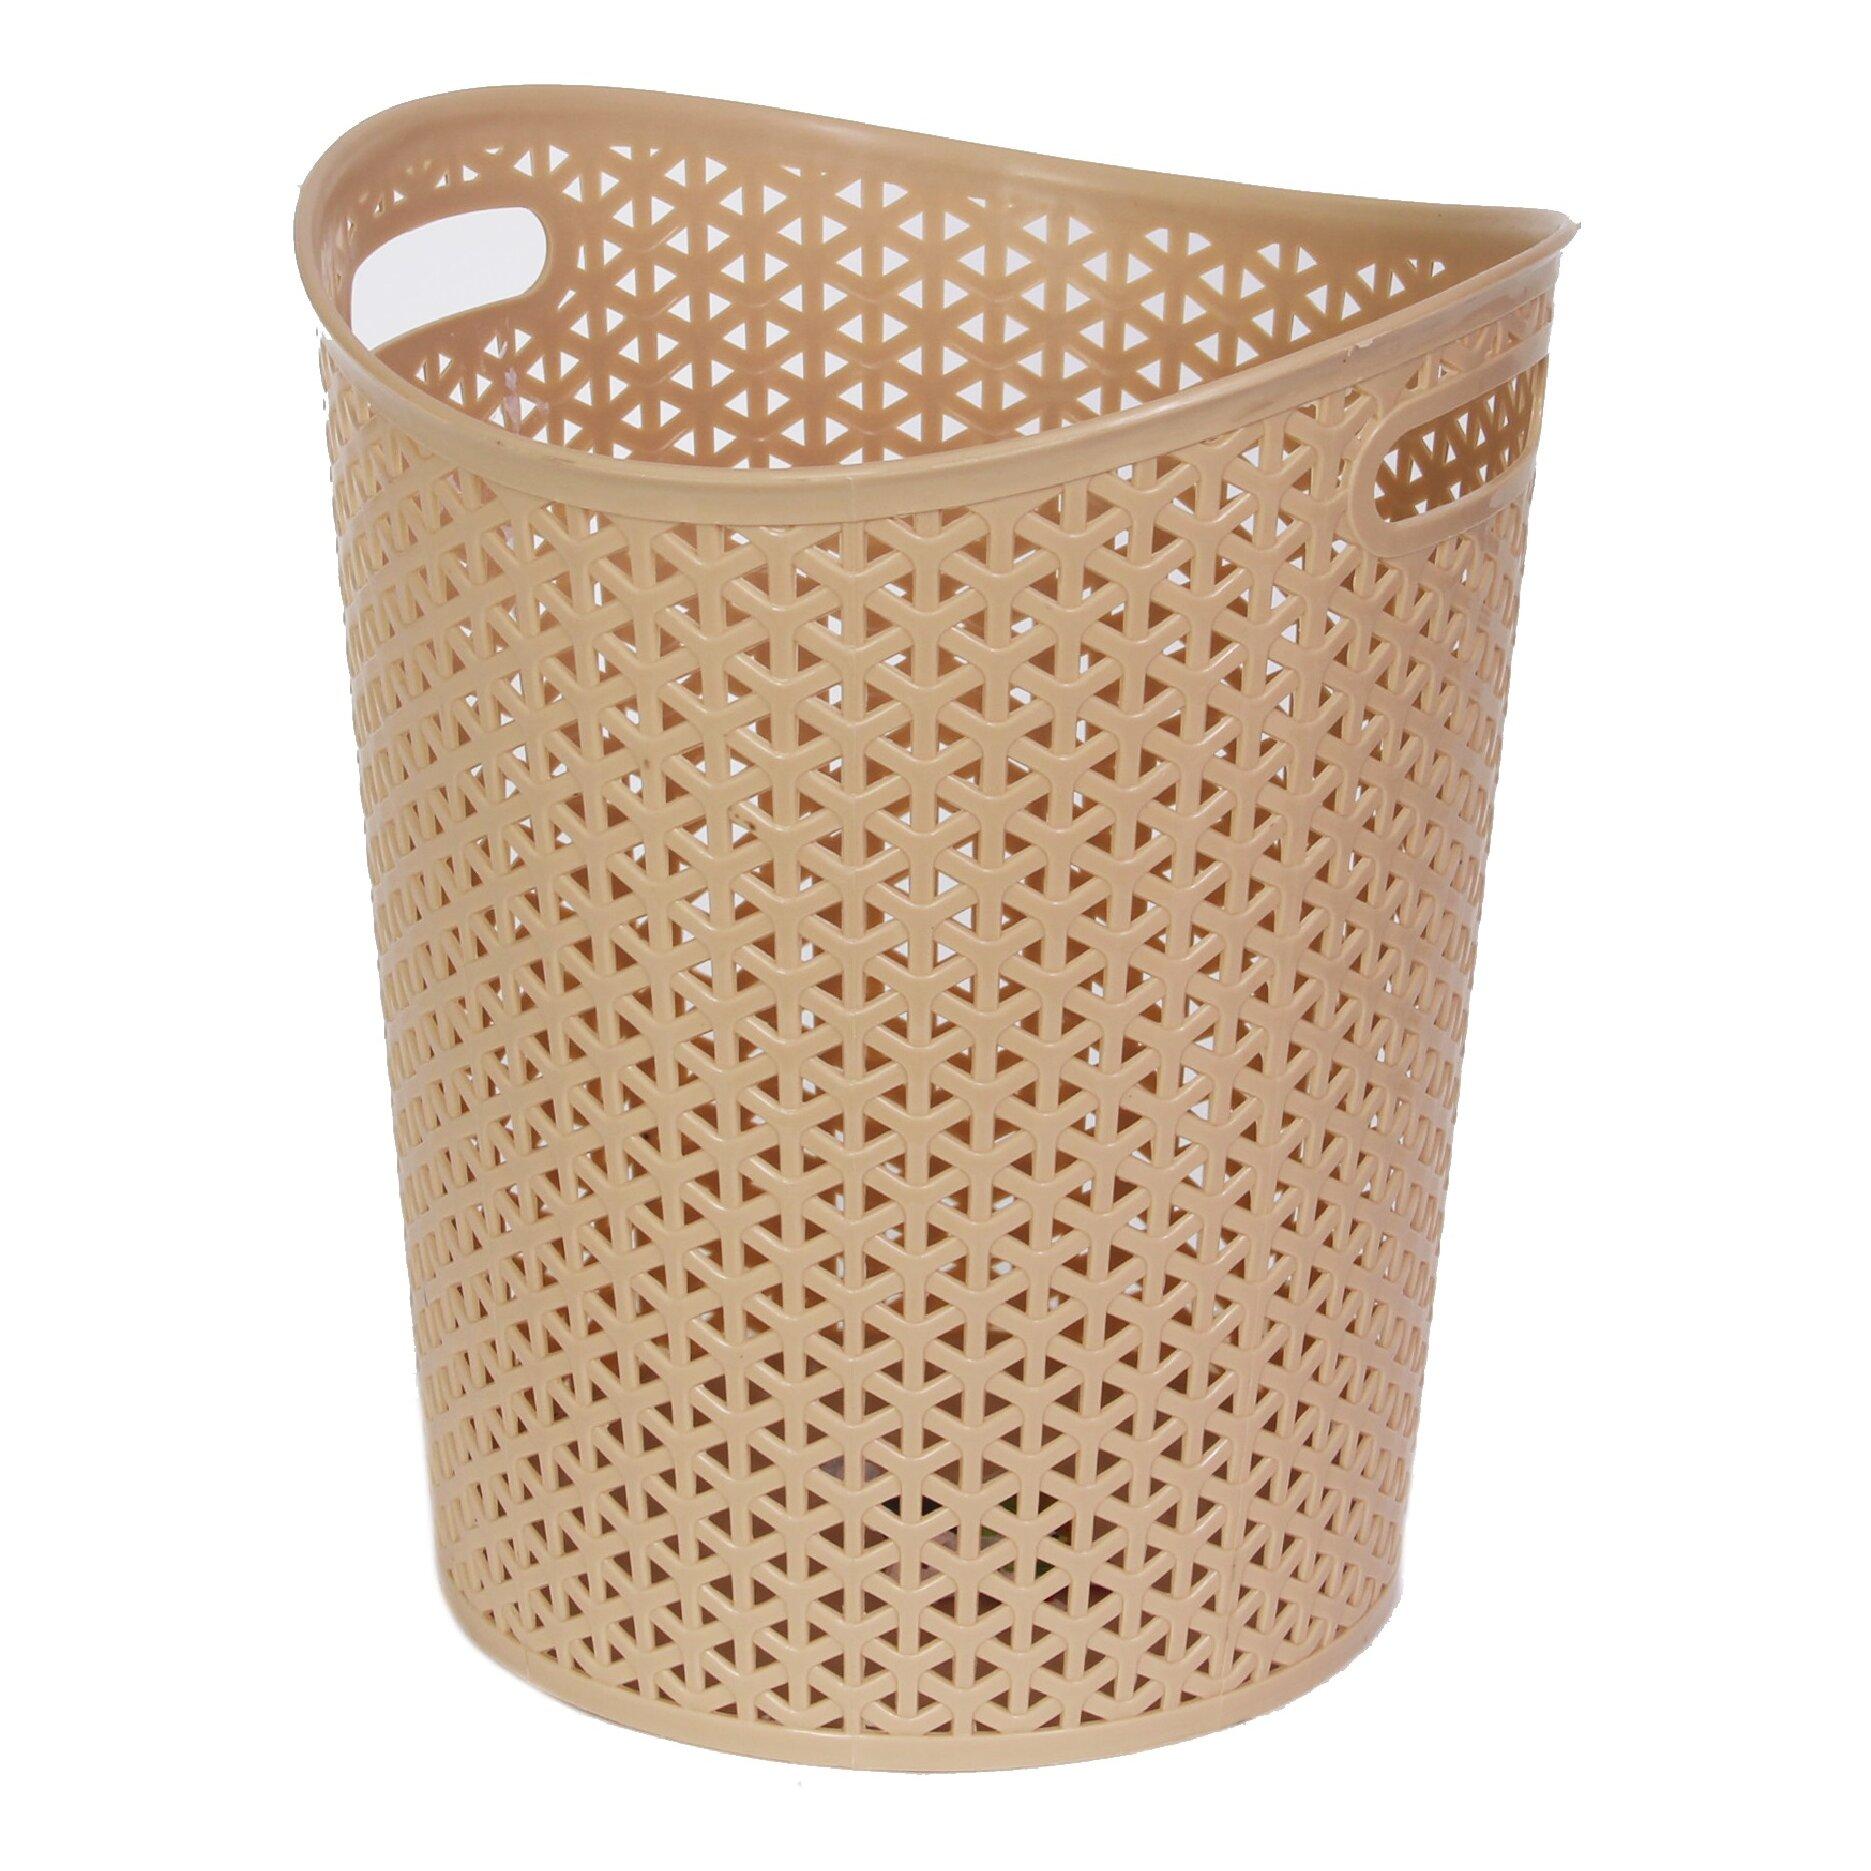 Ybm home rattan plastic waste basket reviews wayfair - Rattan waste basket ...